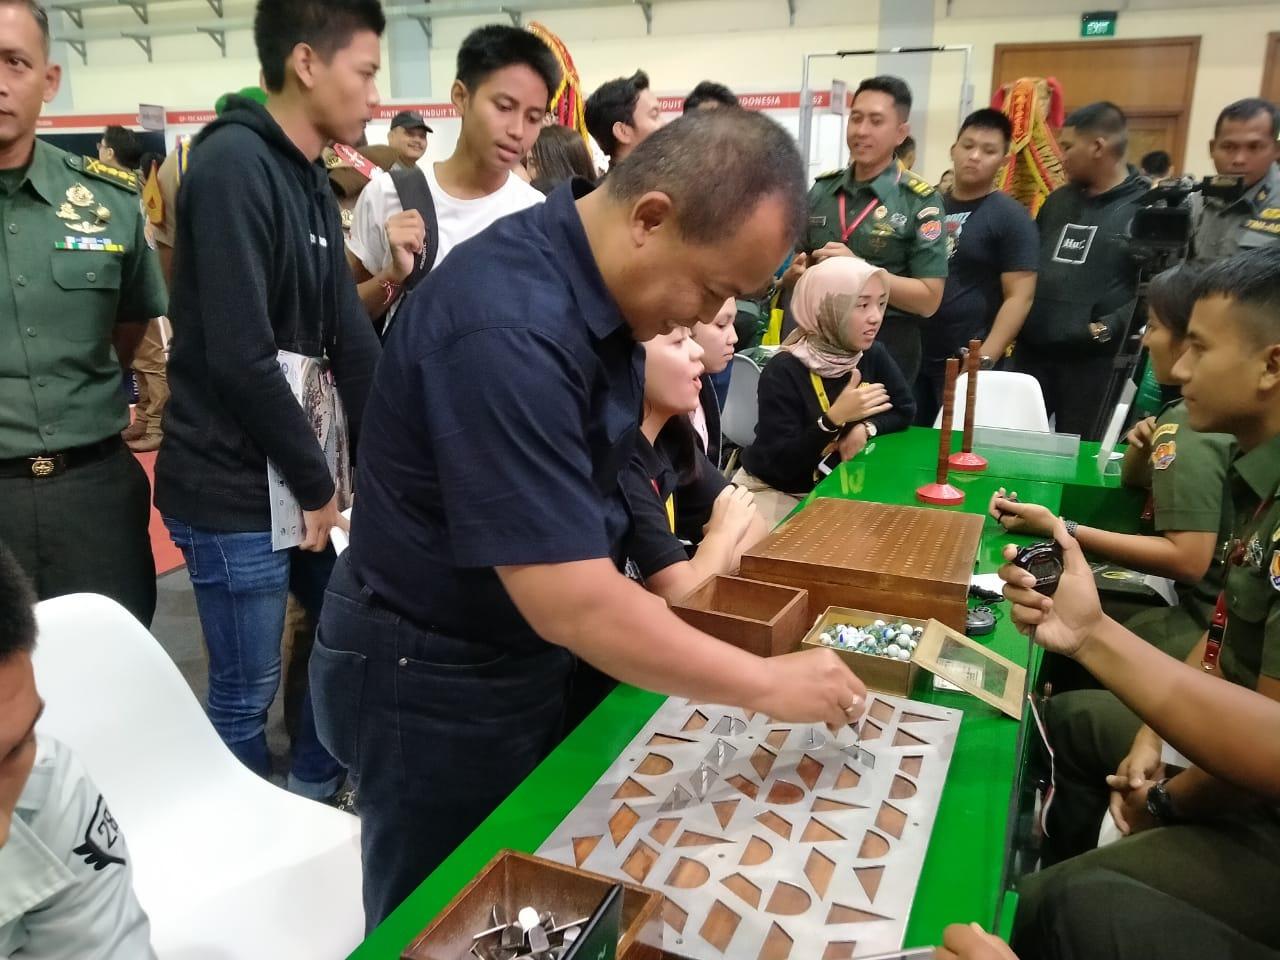 Memperkenalkan Psikologi dalam Rekrutmen Prajurit TNI AD pada Pameran Indonesia Education Training